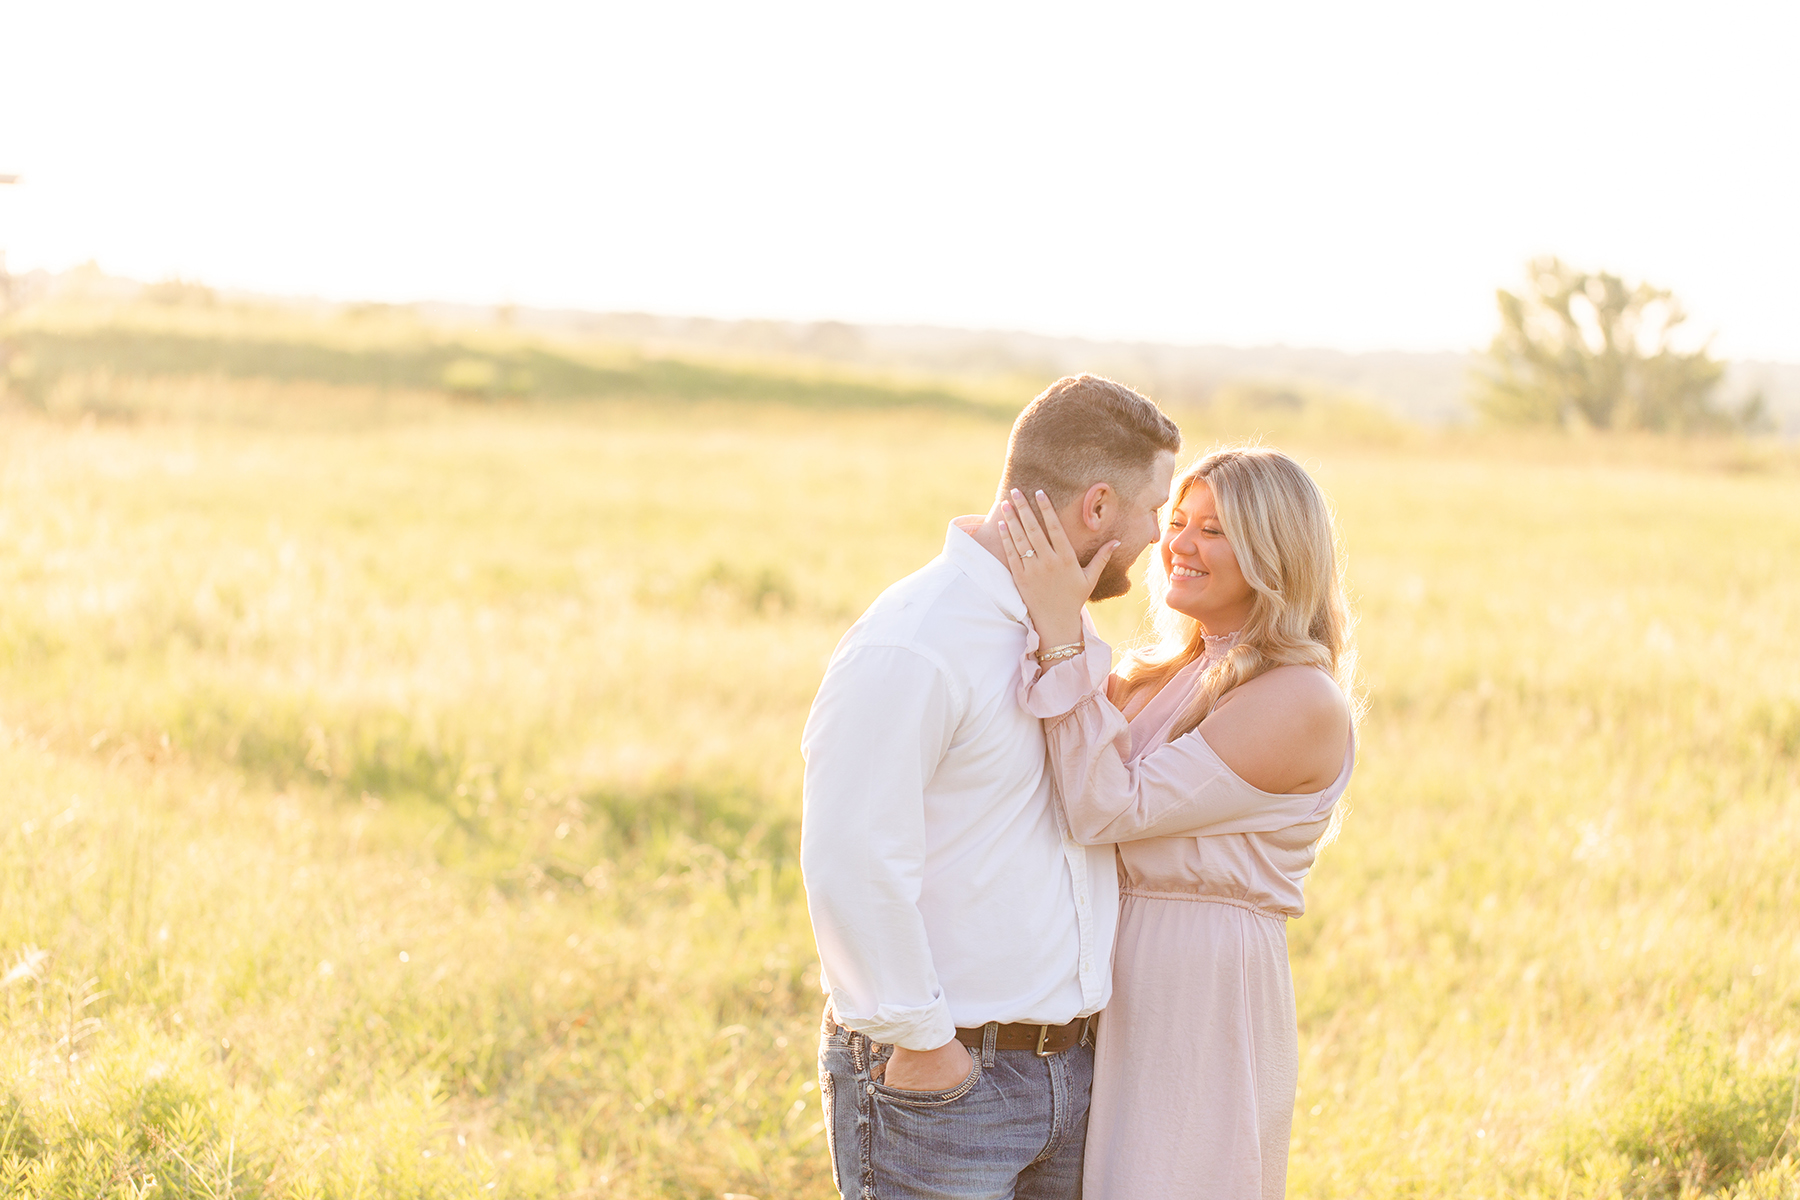 Megan + Bradley | Engagement